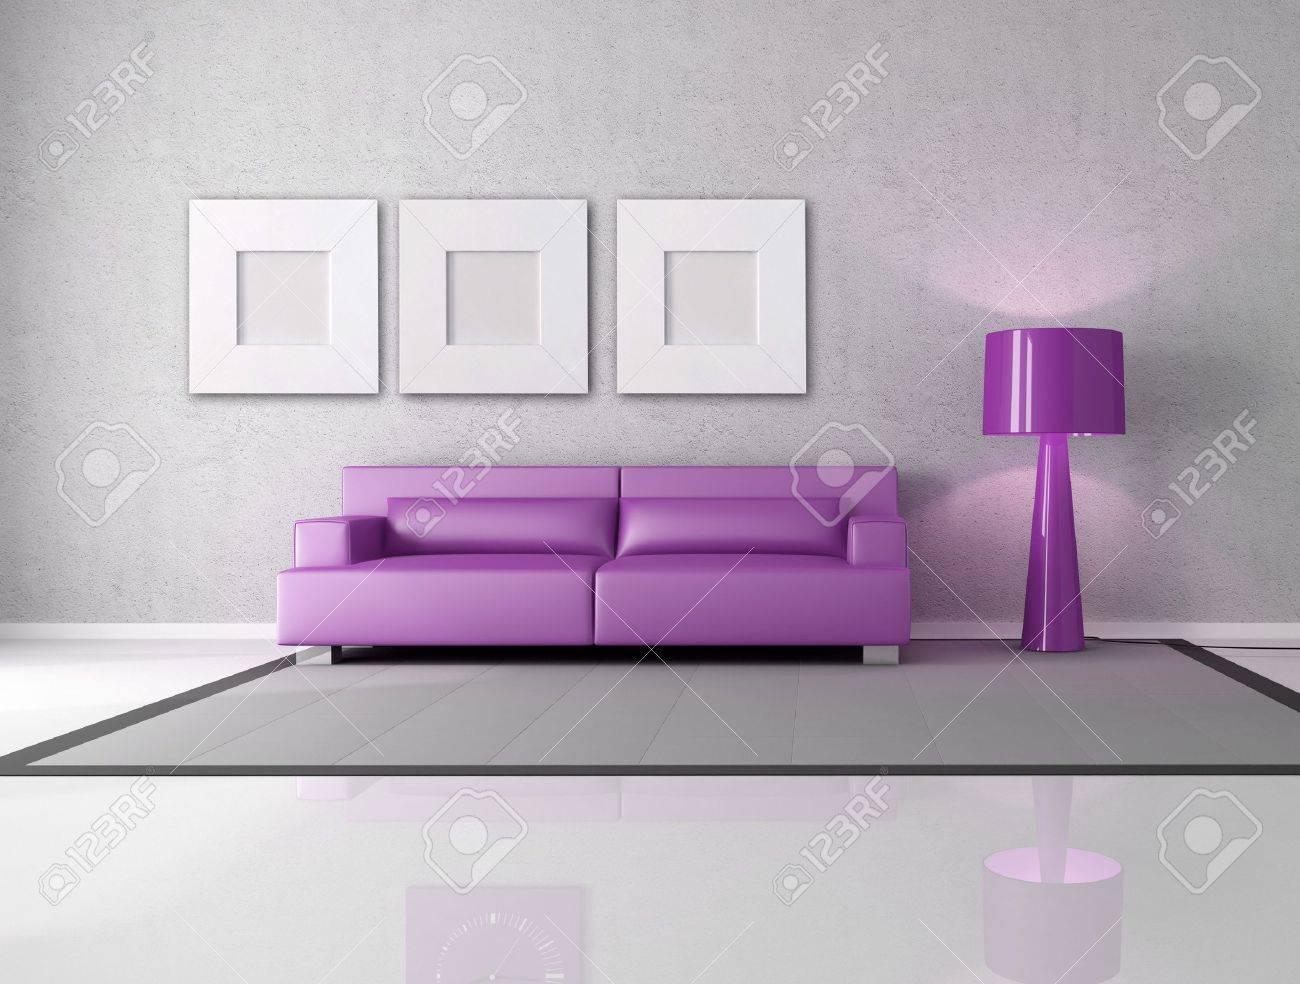 Purple Living Room Furniture Minimalist Gray And Purple Living Room With Fashion Lamp Stock